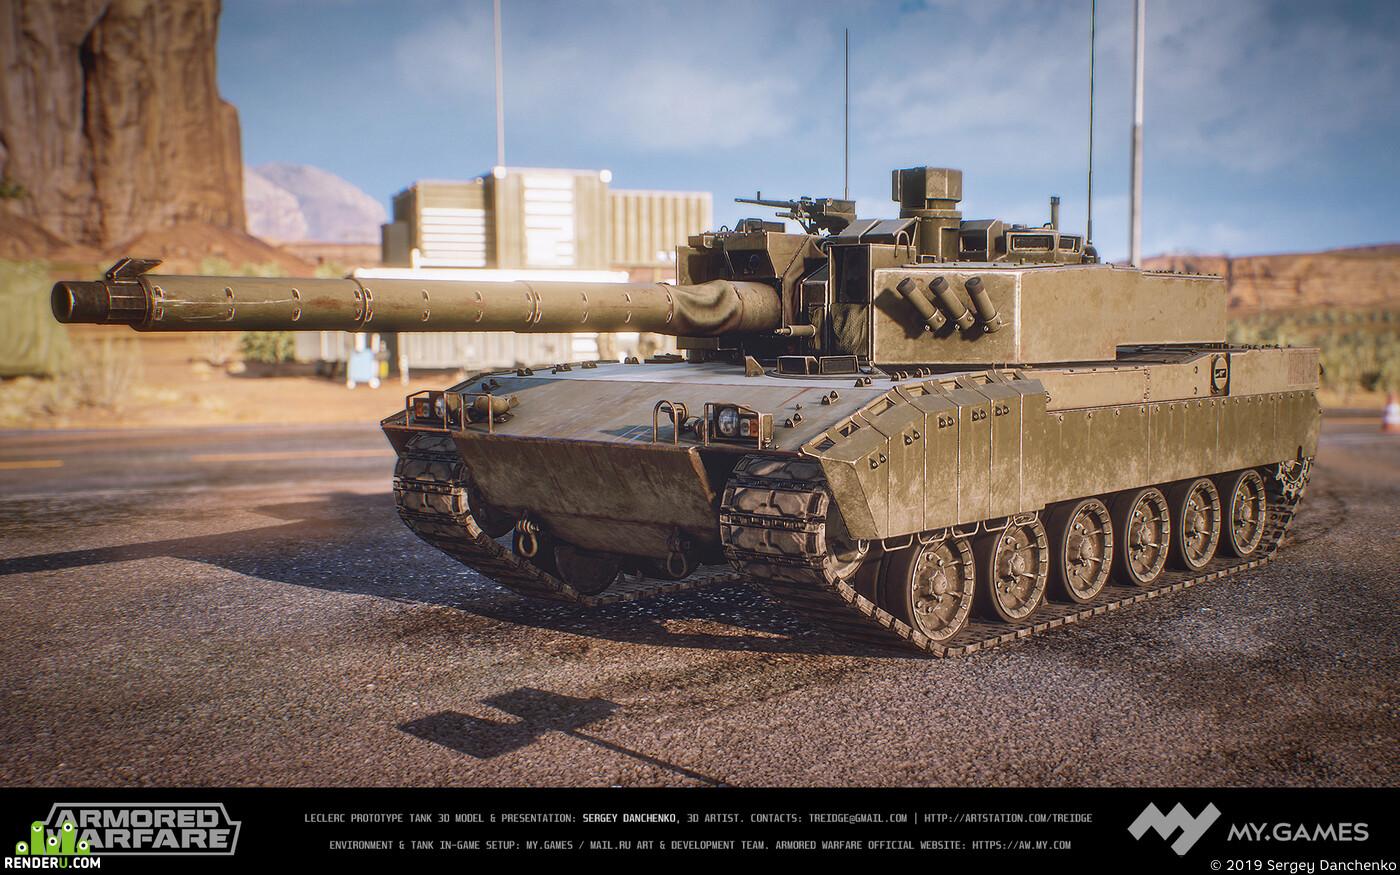 Digital 3D, Transport & Vehicles, weapons, Tanks, Armored Vehicle, gun